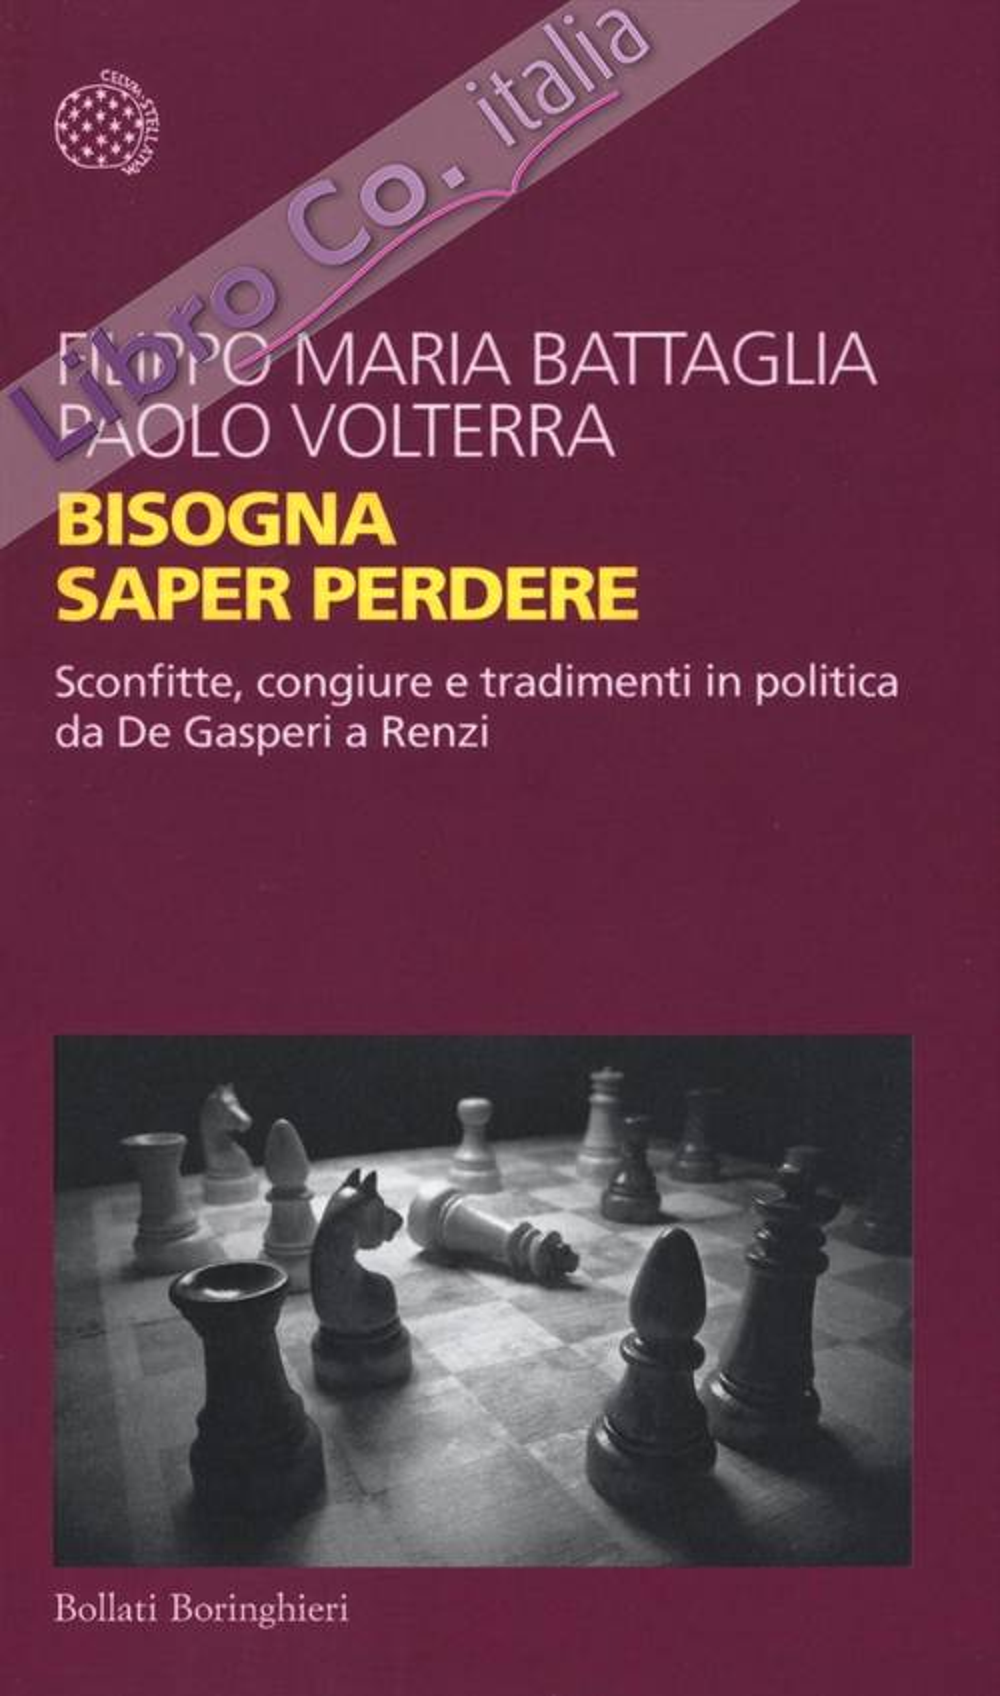 Bisogna saper perdere. Sconfitte, congiure e tradimenti in politica da De Gasperi a Renzi.